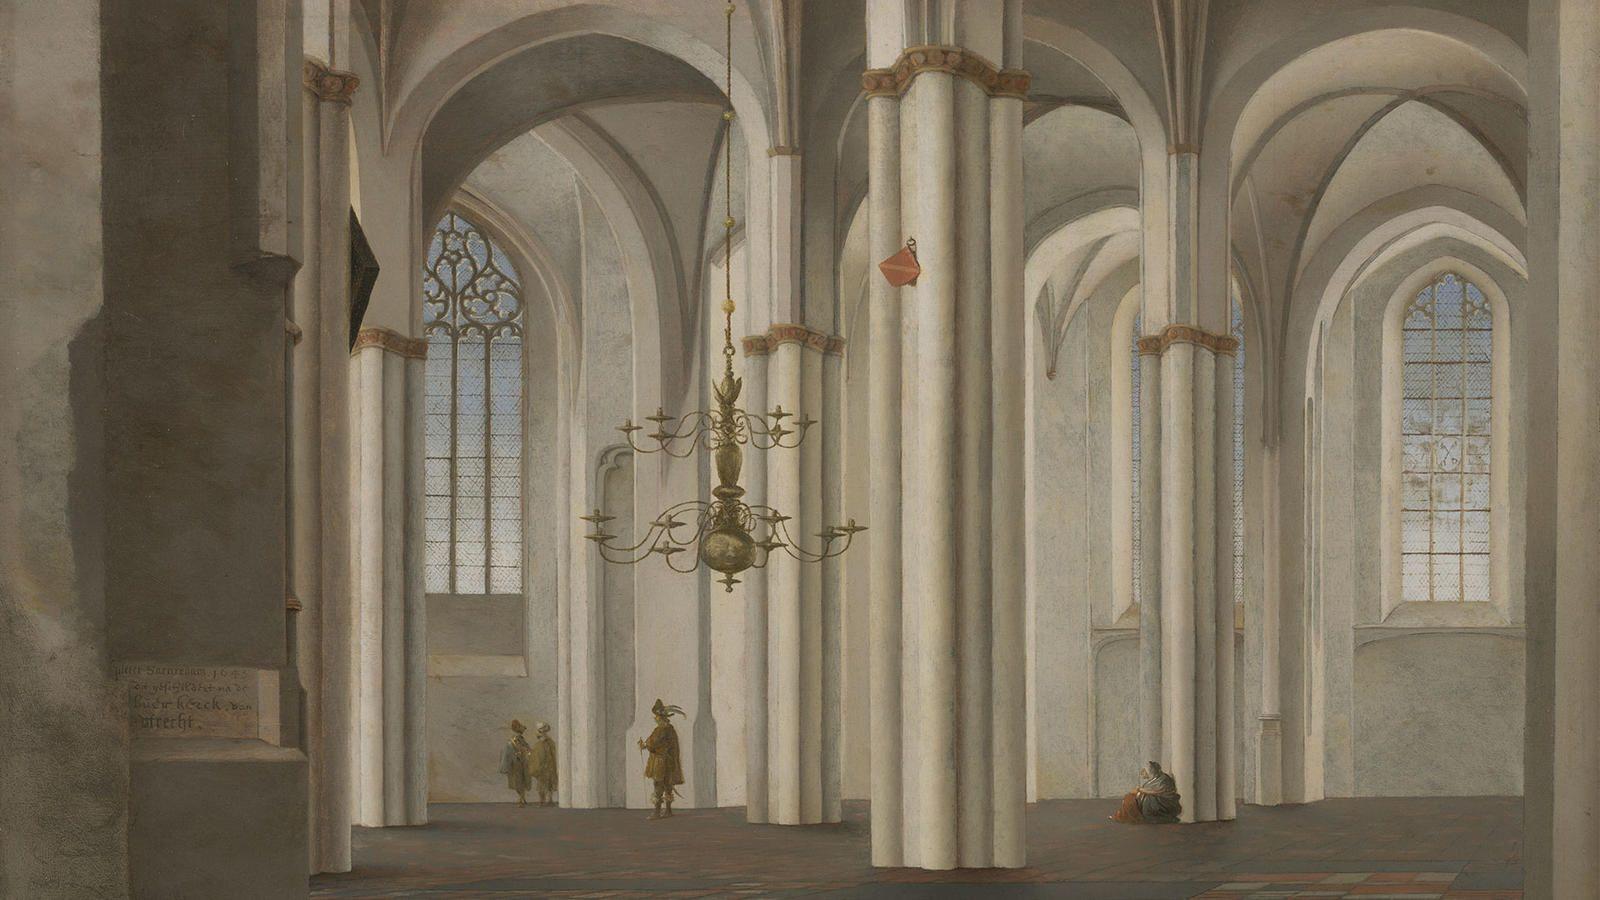 Saenredam, Interior of the Buurkerk, Utrecht